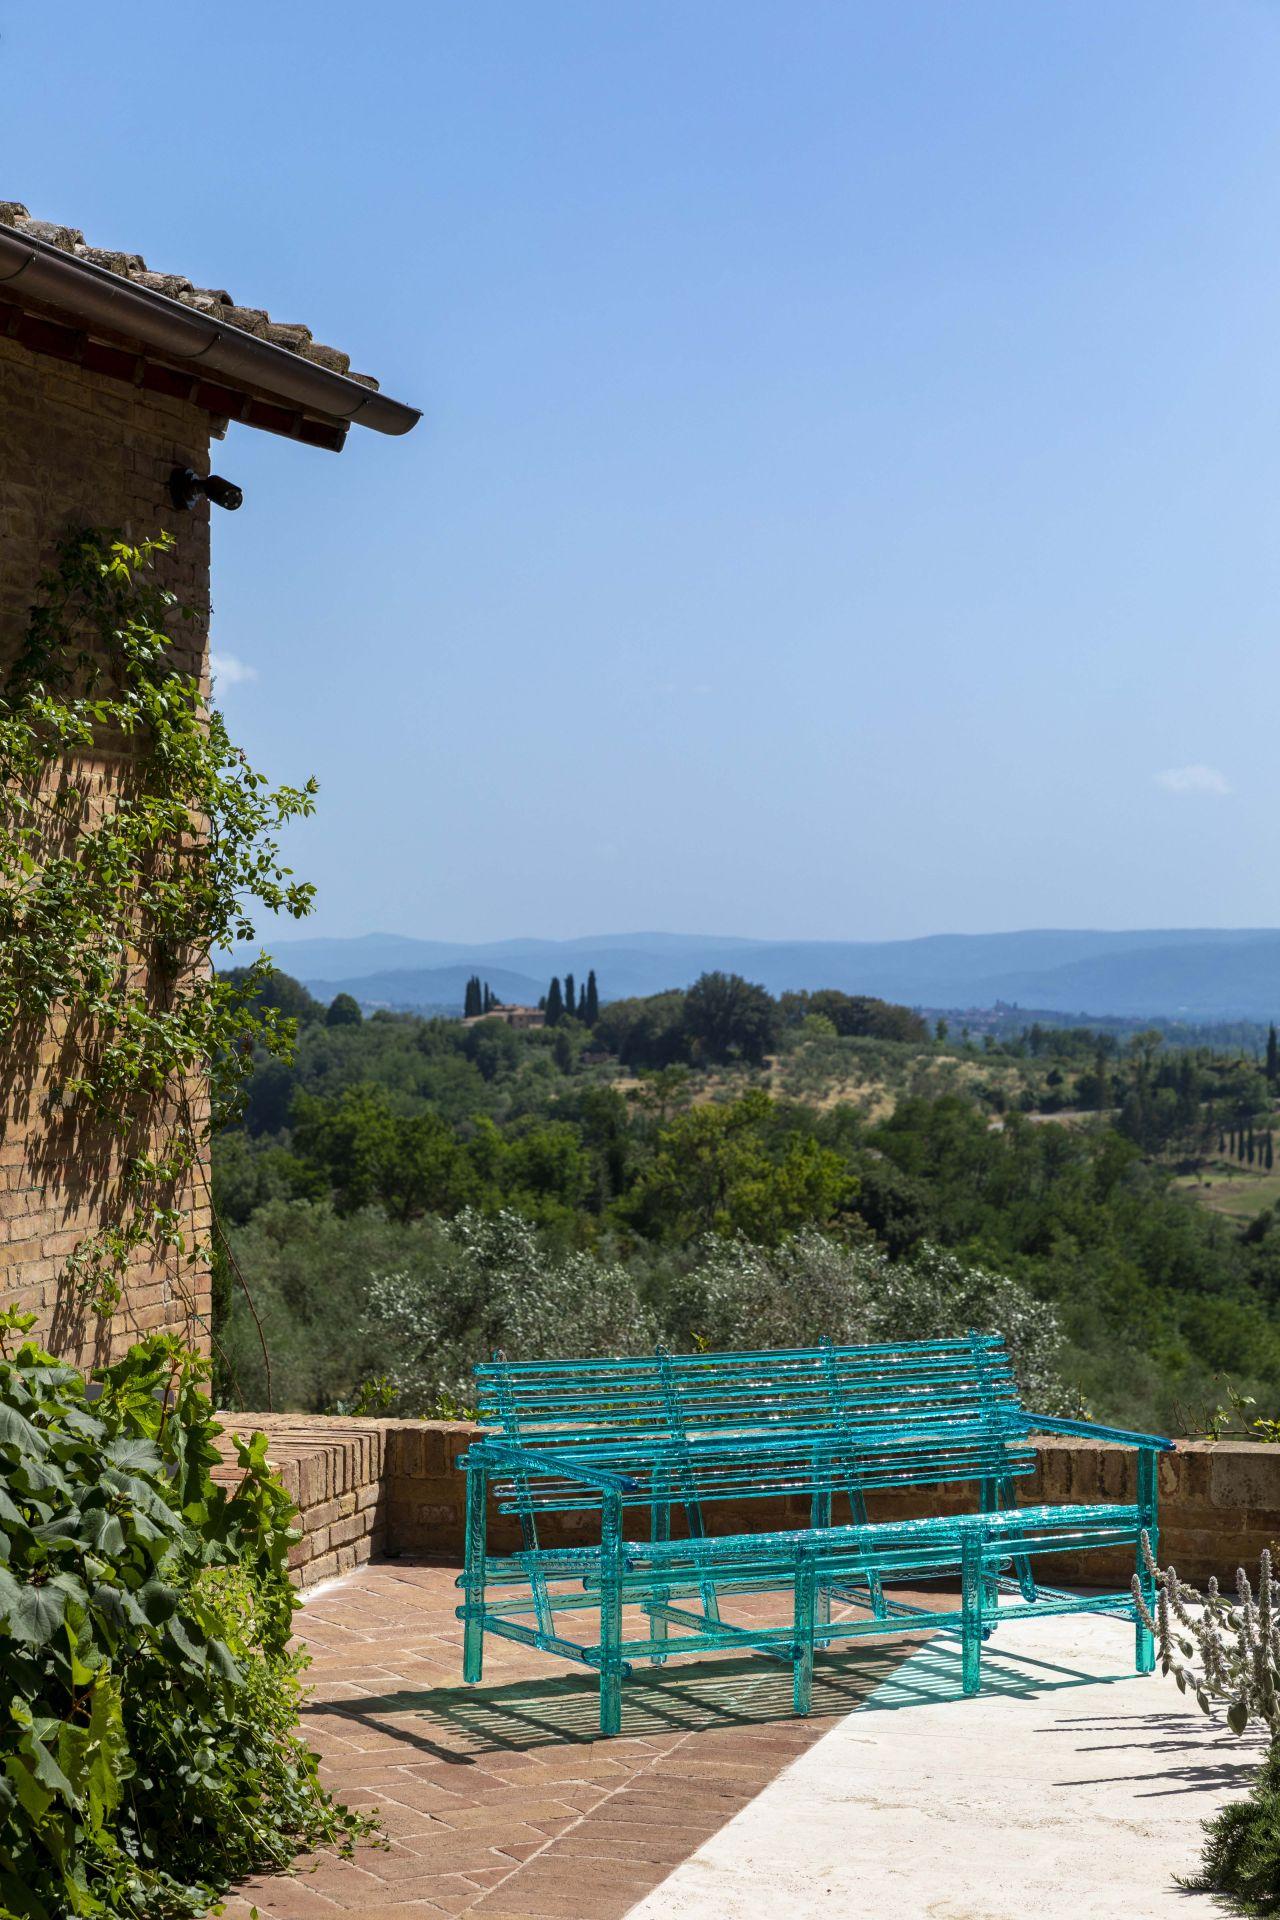 Villa in Siena - Tuscany - image 15